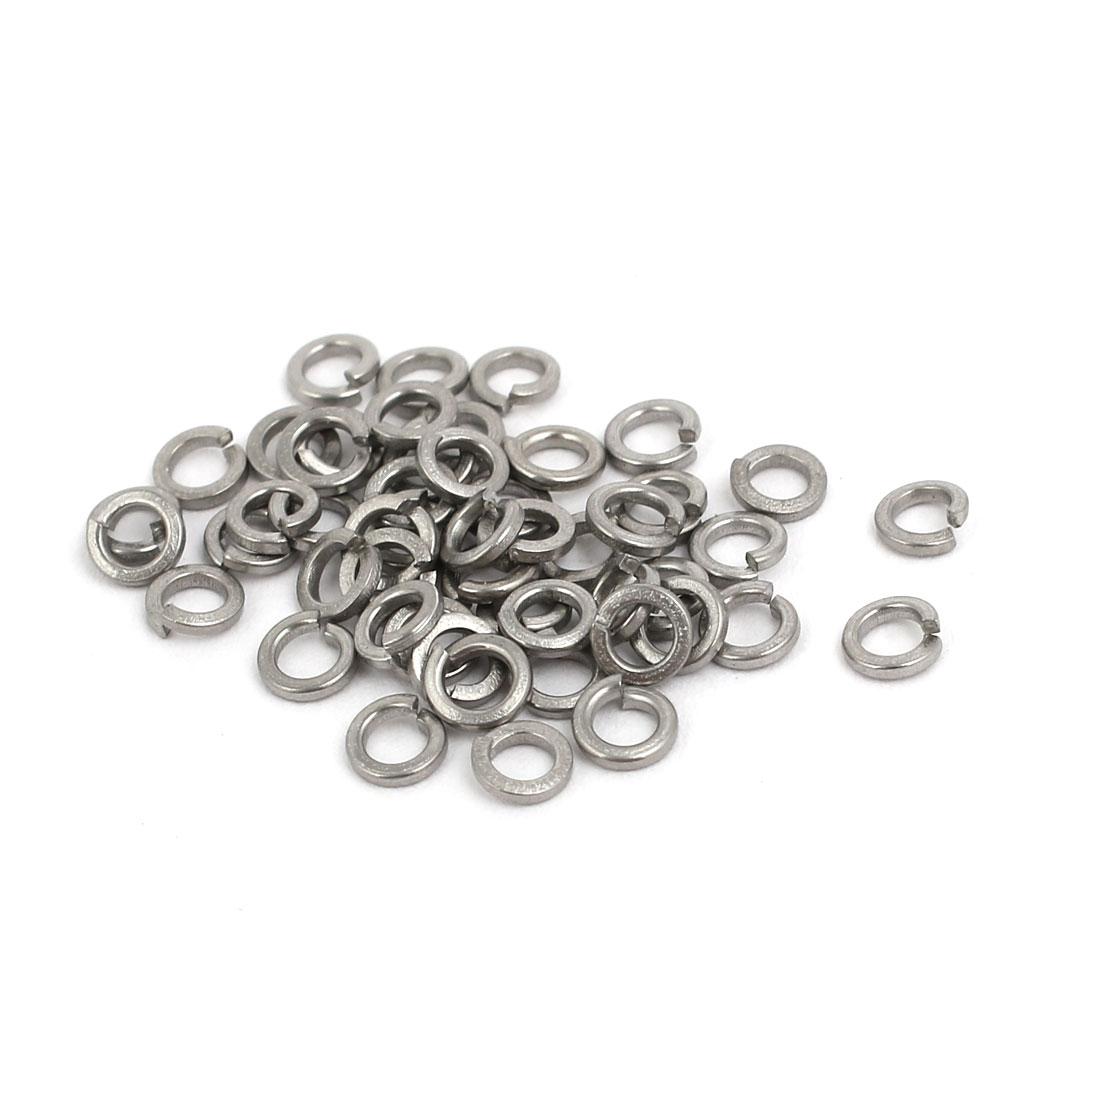 M2 Inner Diameter 304 Stainless Steel Split Lock Spring Washers Gasket 50pcs